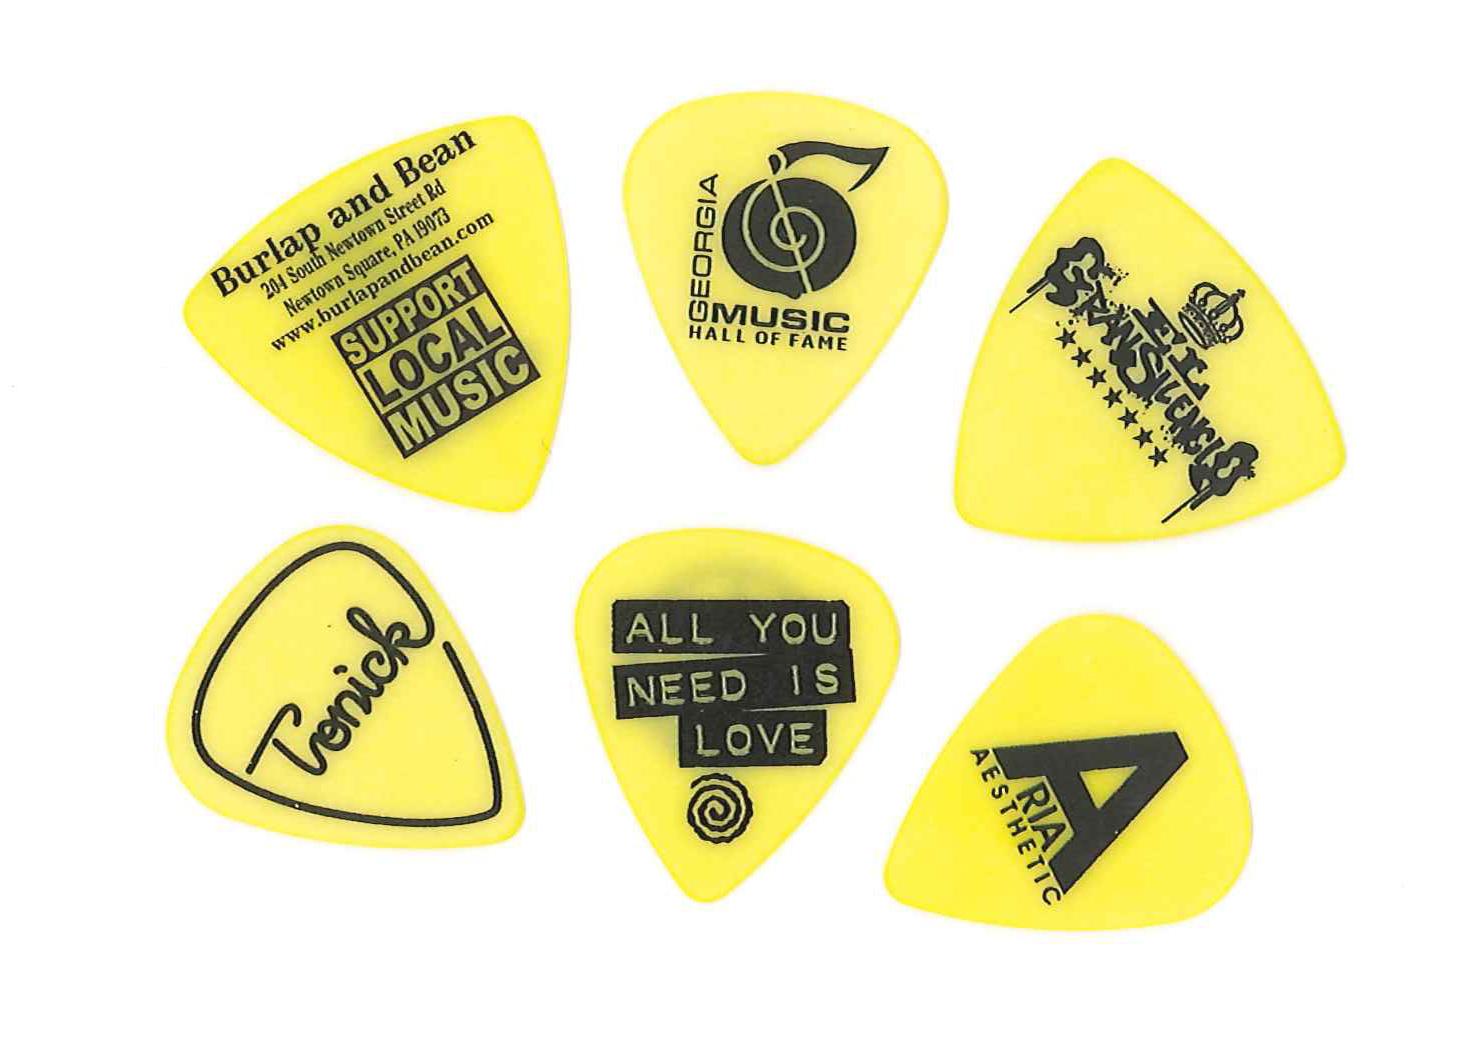 guitar picks | Steve Clayton Official Blog - Part 8